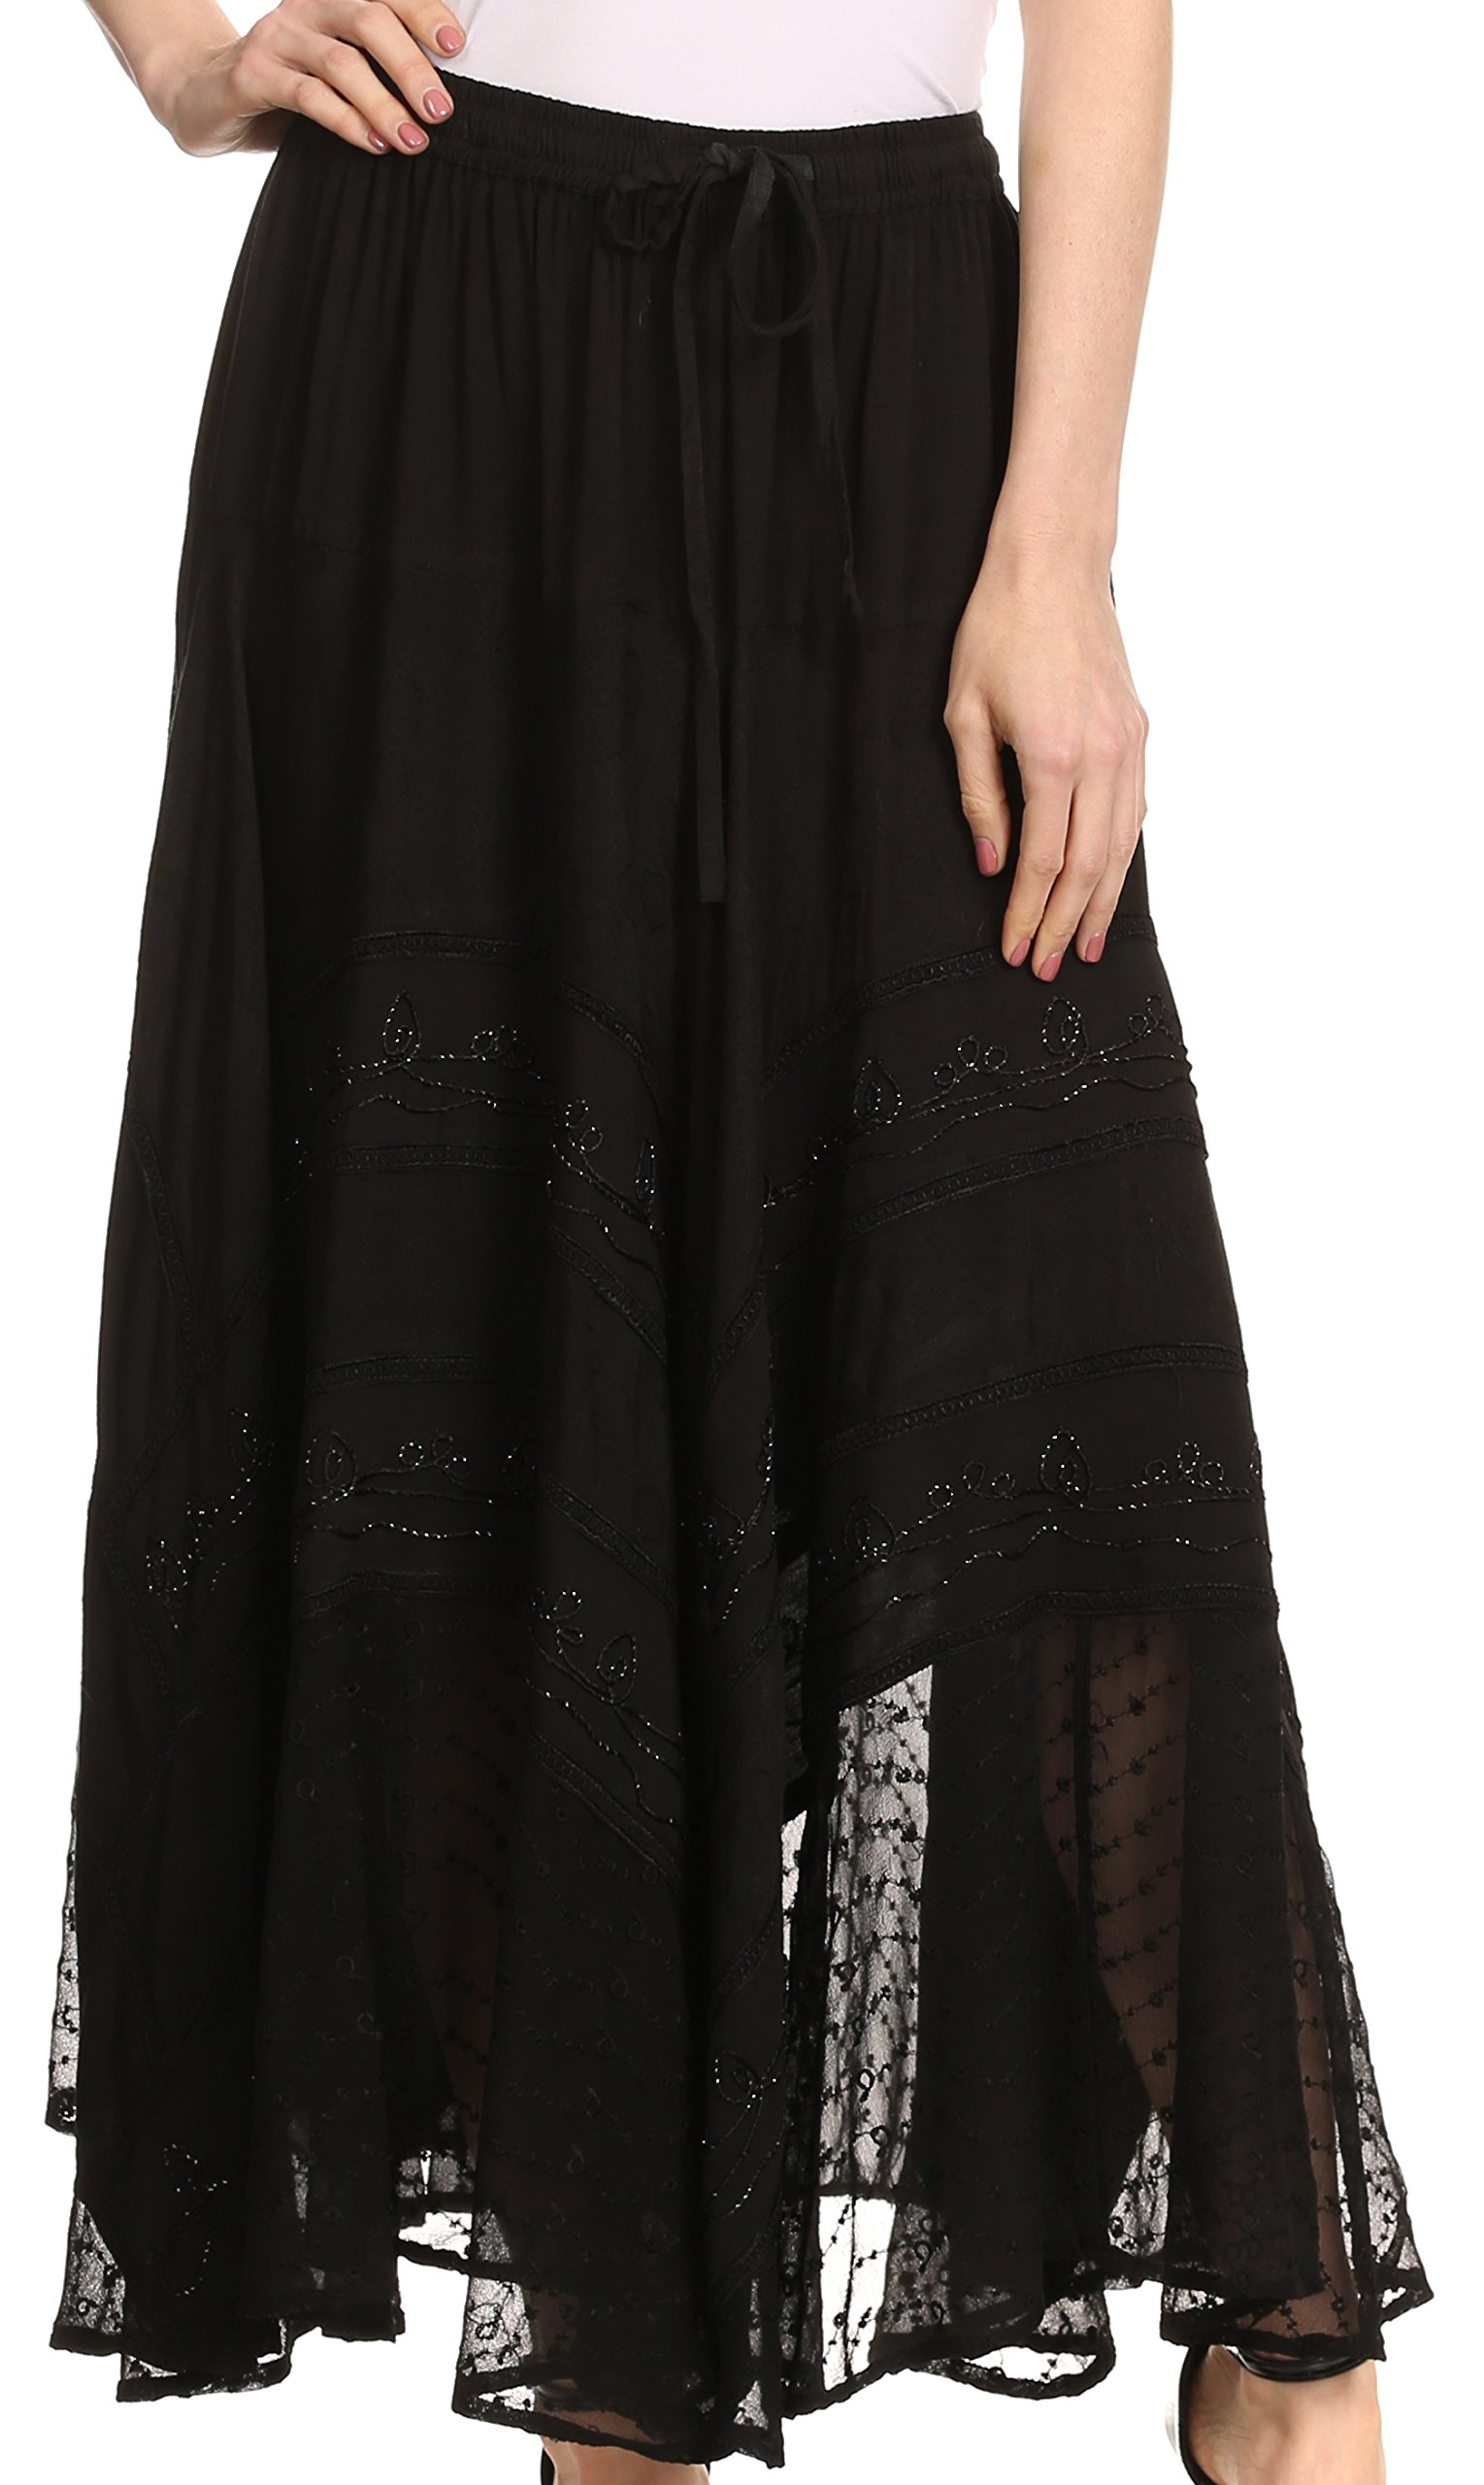 Sakkas 13222 Ivy Maiden Boho Skirt - Black - OSP